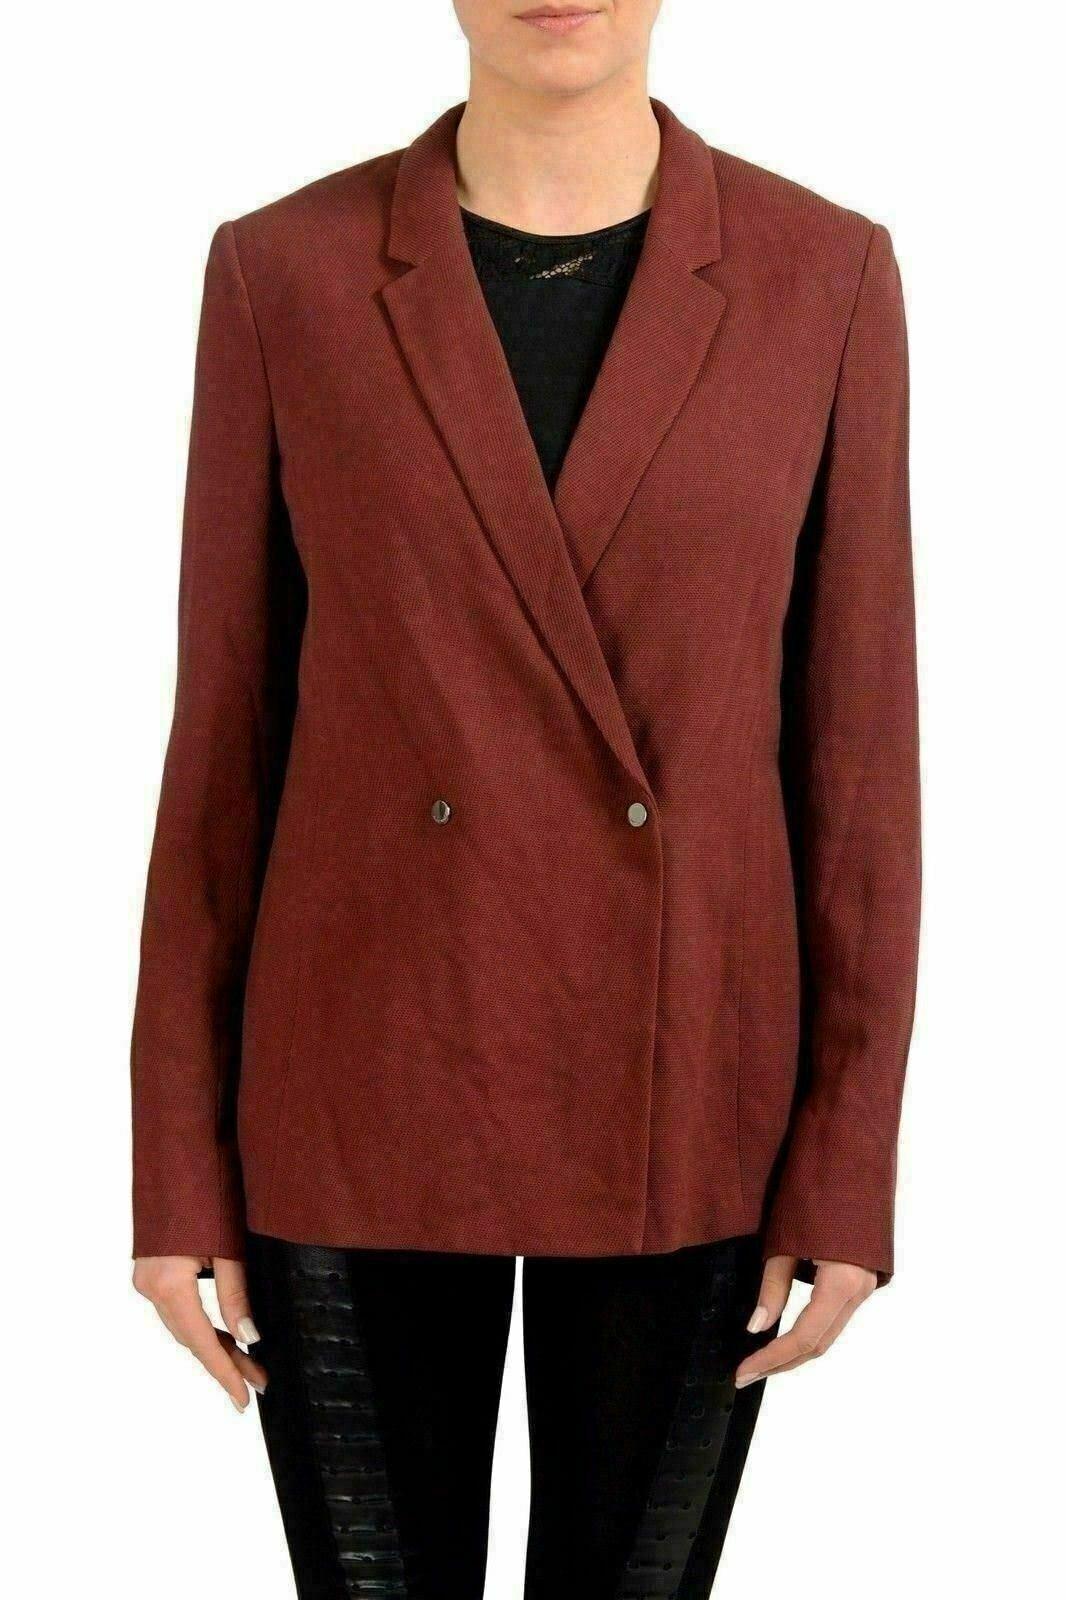 Hugo Boss Jaftina Wool Burgundy Double Breasted Women's Blazer US S IT 40